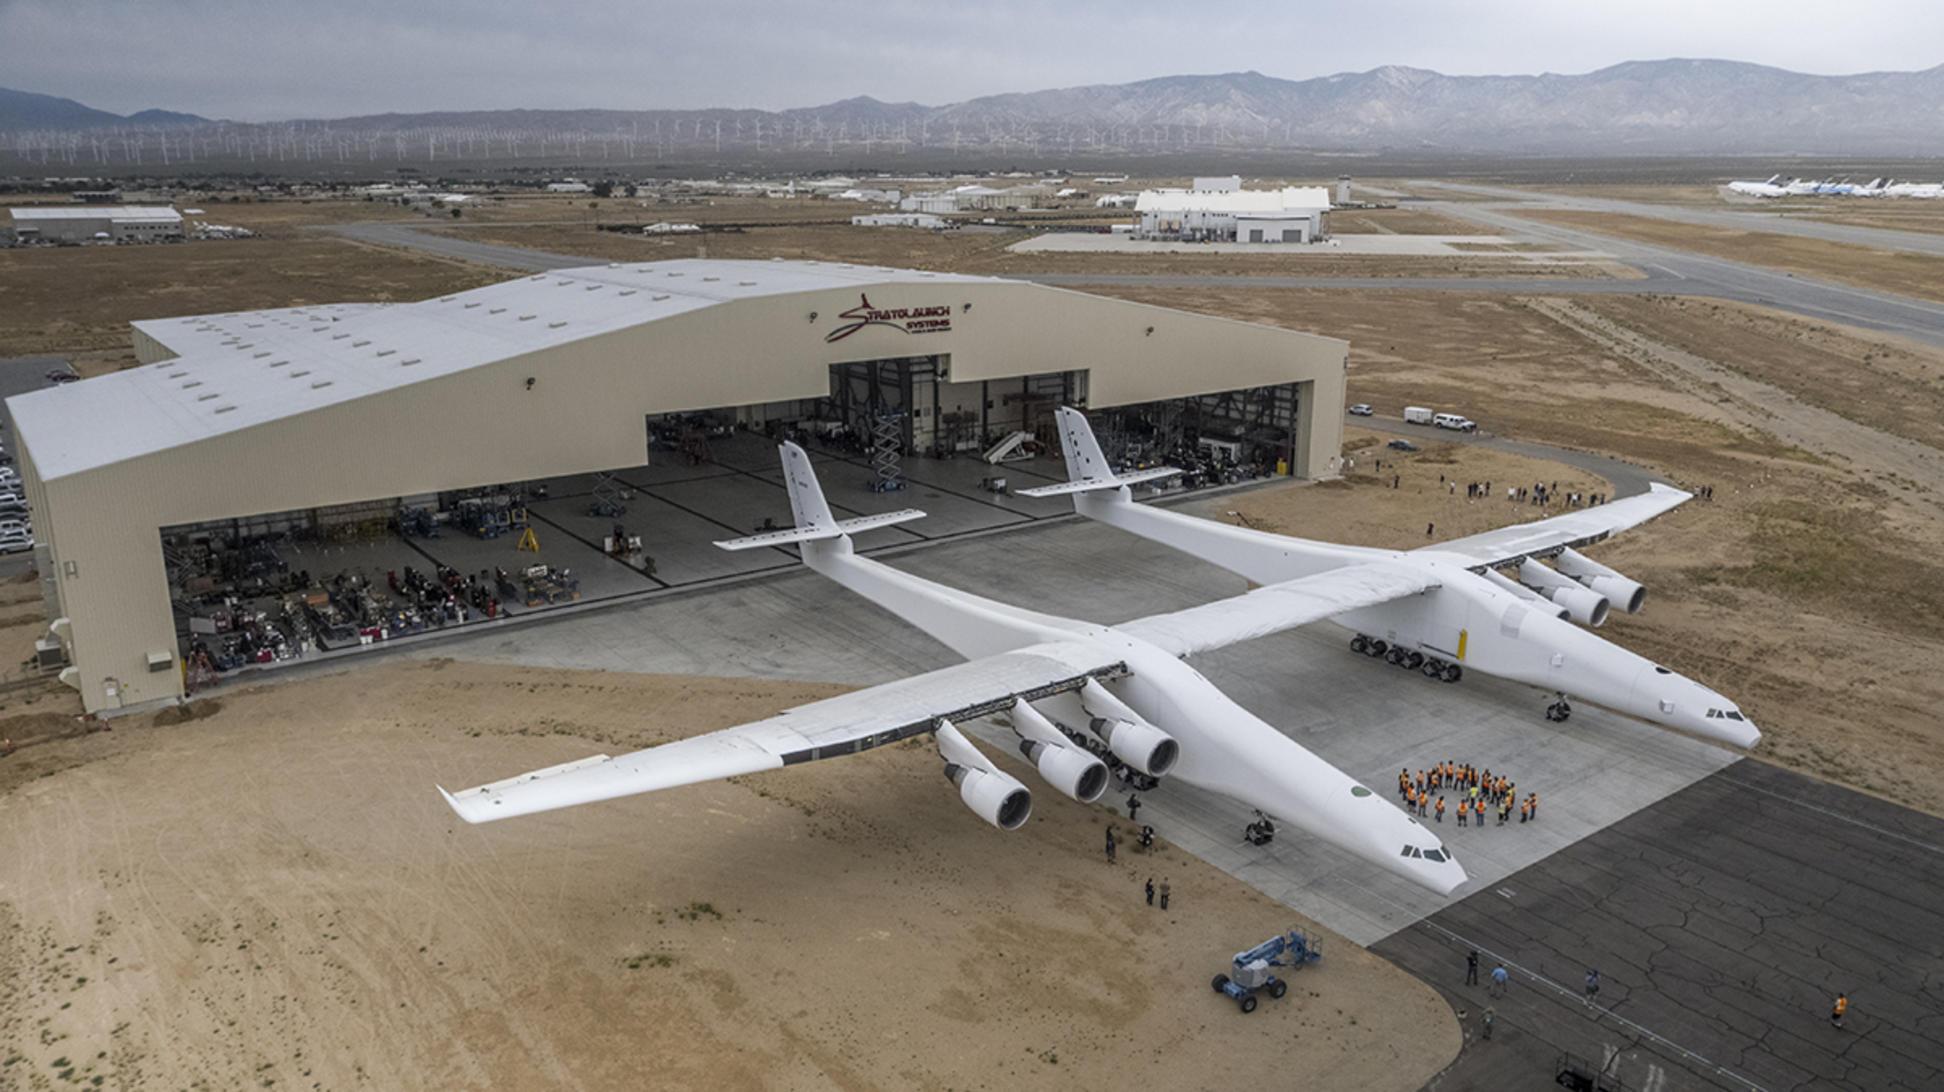 بزرگترين هواپيماي جهان